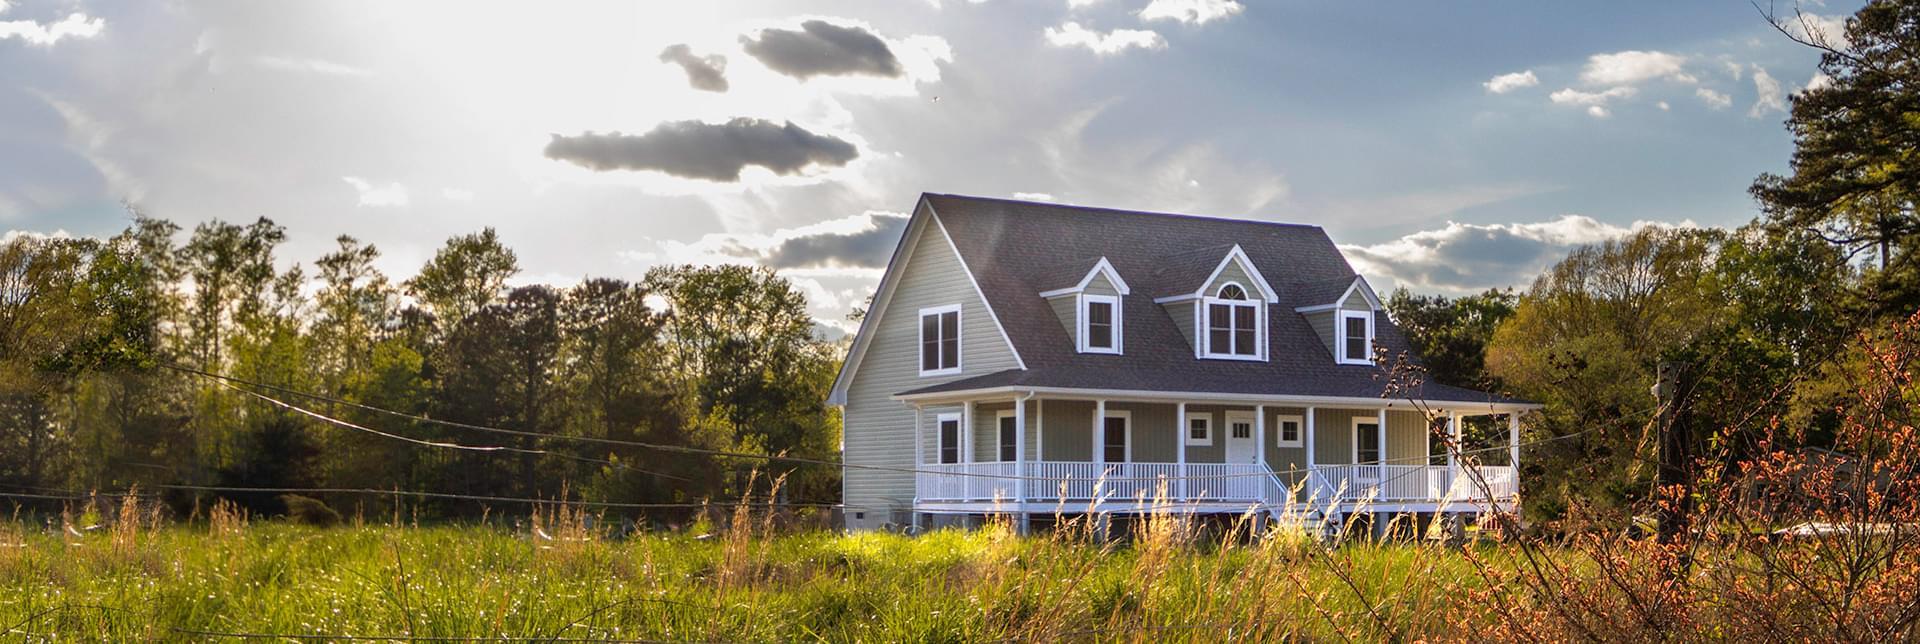 New Homes in Amelia County VA